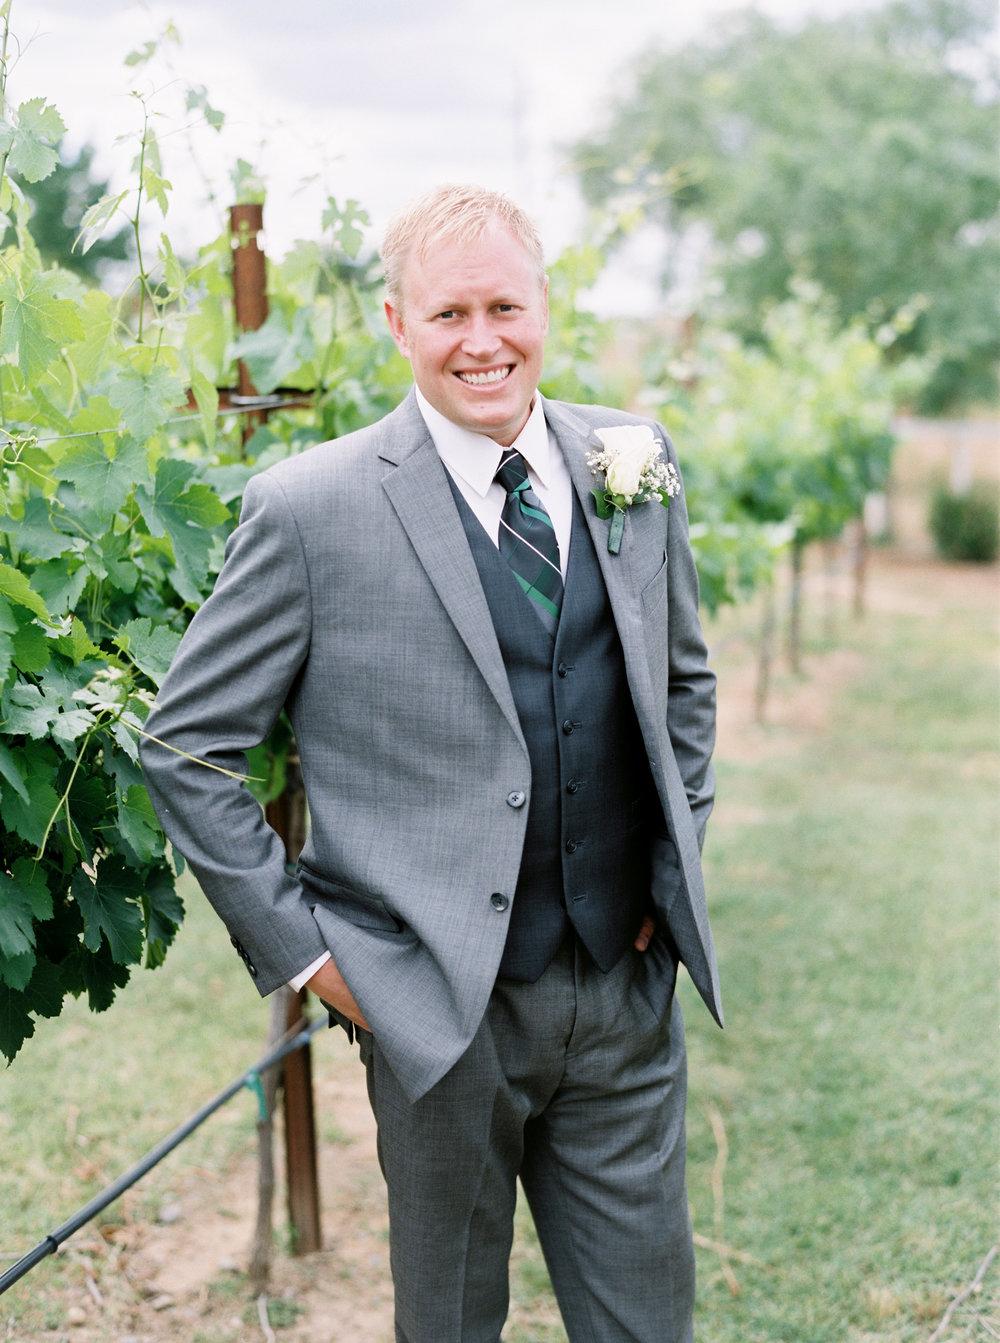 wolfe-heights-event-center-wedding-sacramento-california-wedding-63.jpg